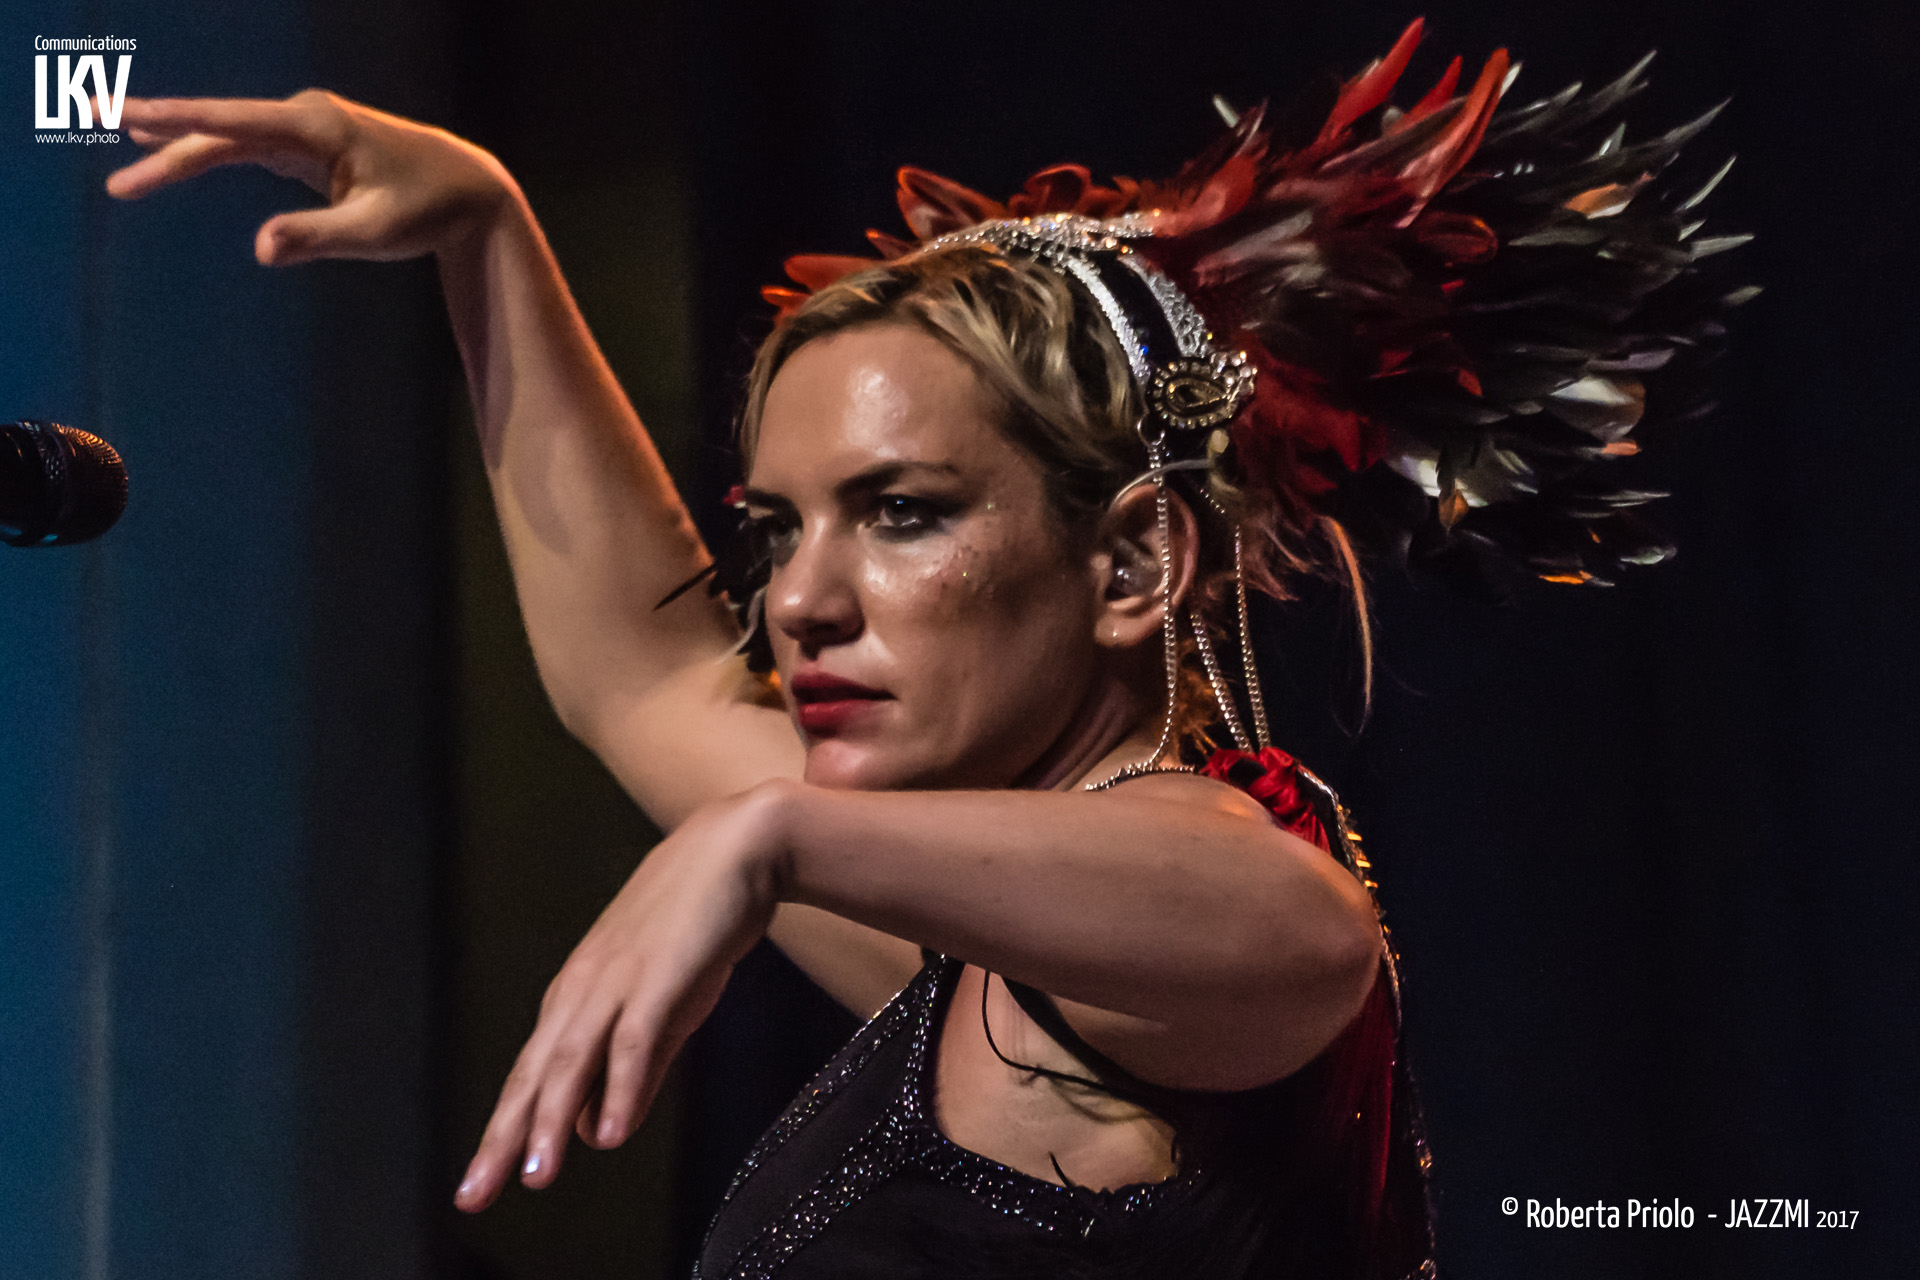 Roberta Priolo </br> Electric Swing Circus </br> Reportage